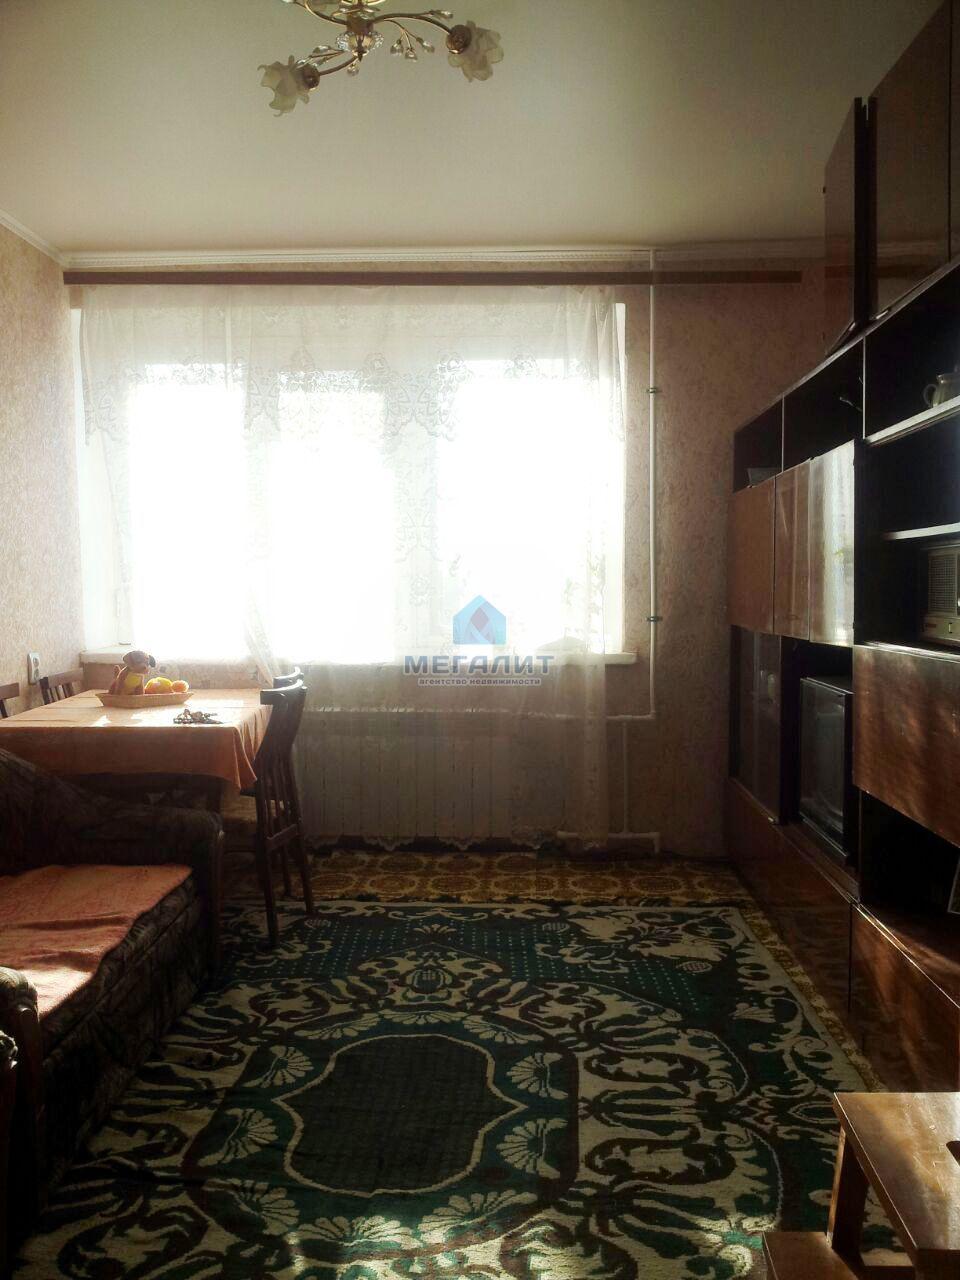 Аренда 2-к квартиры Можайского 17, 55 м2  (миниатюра №11)